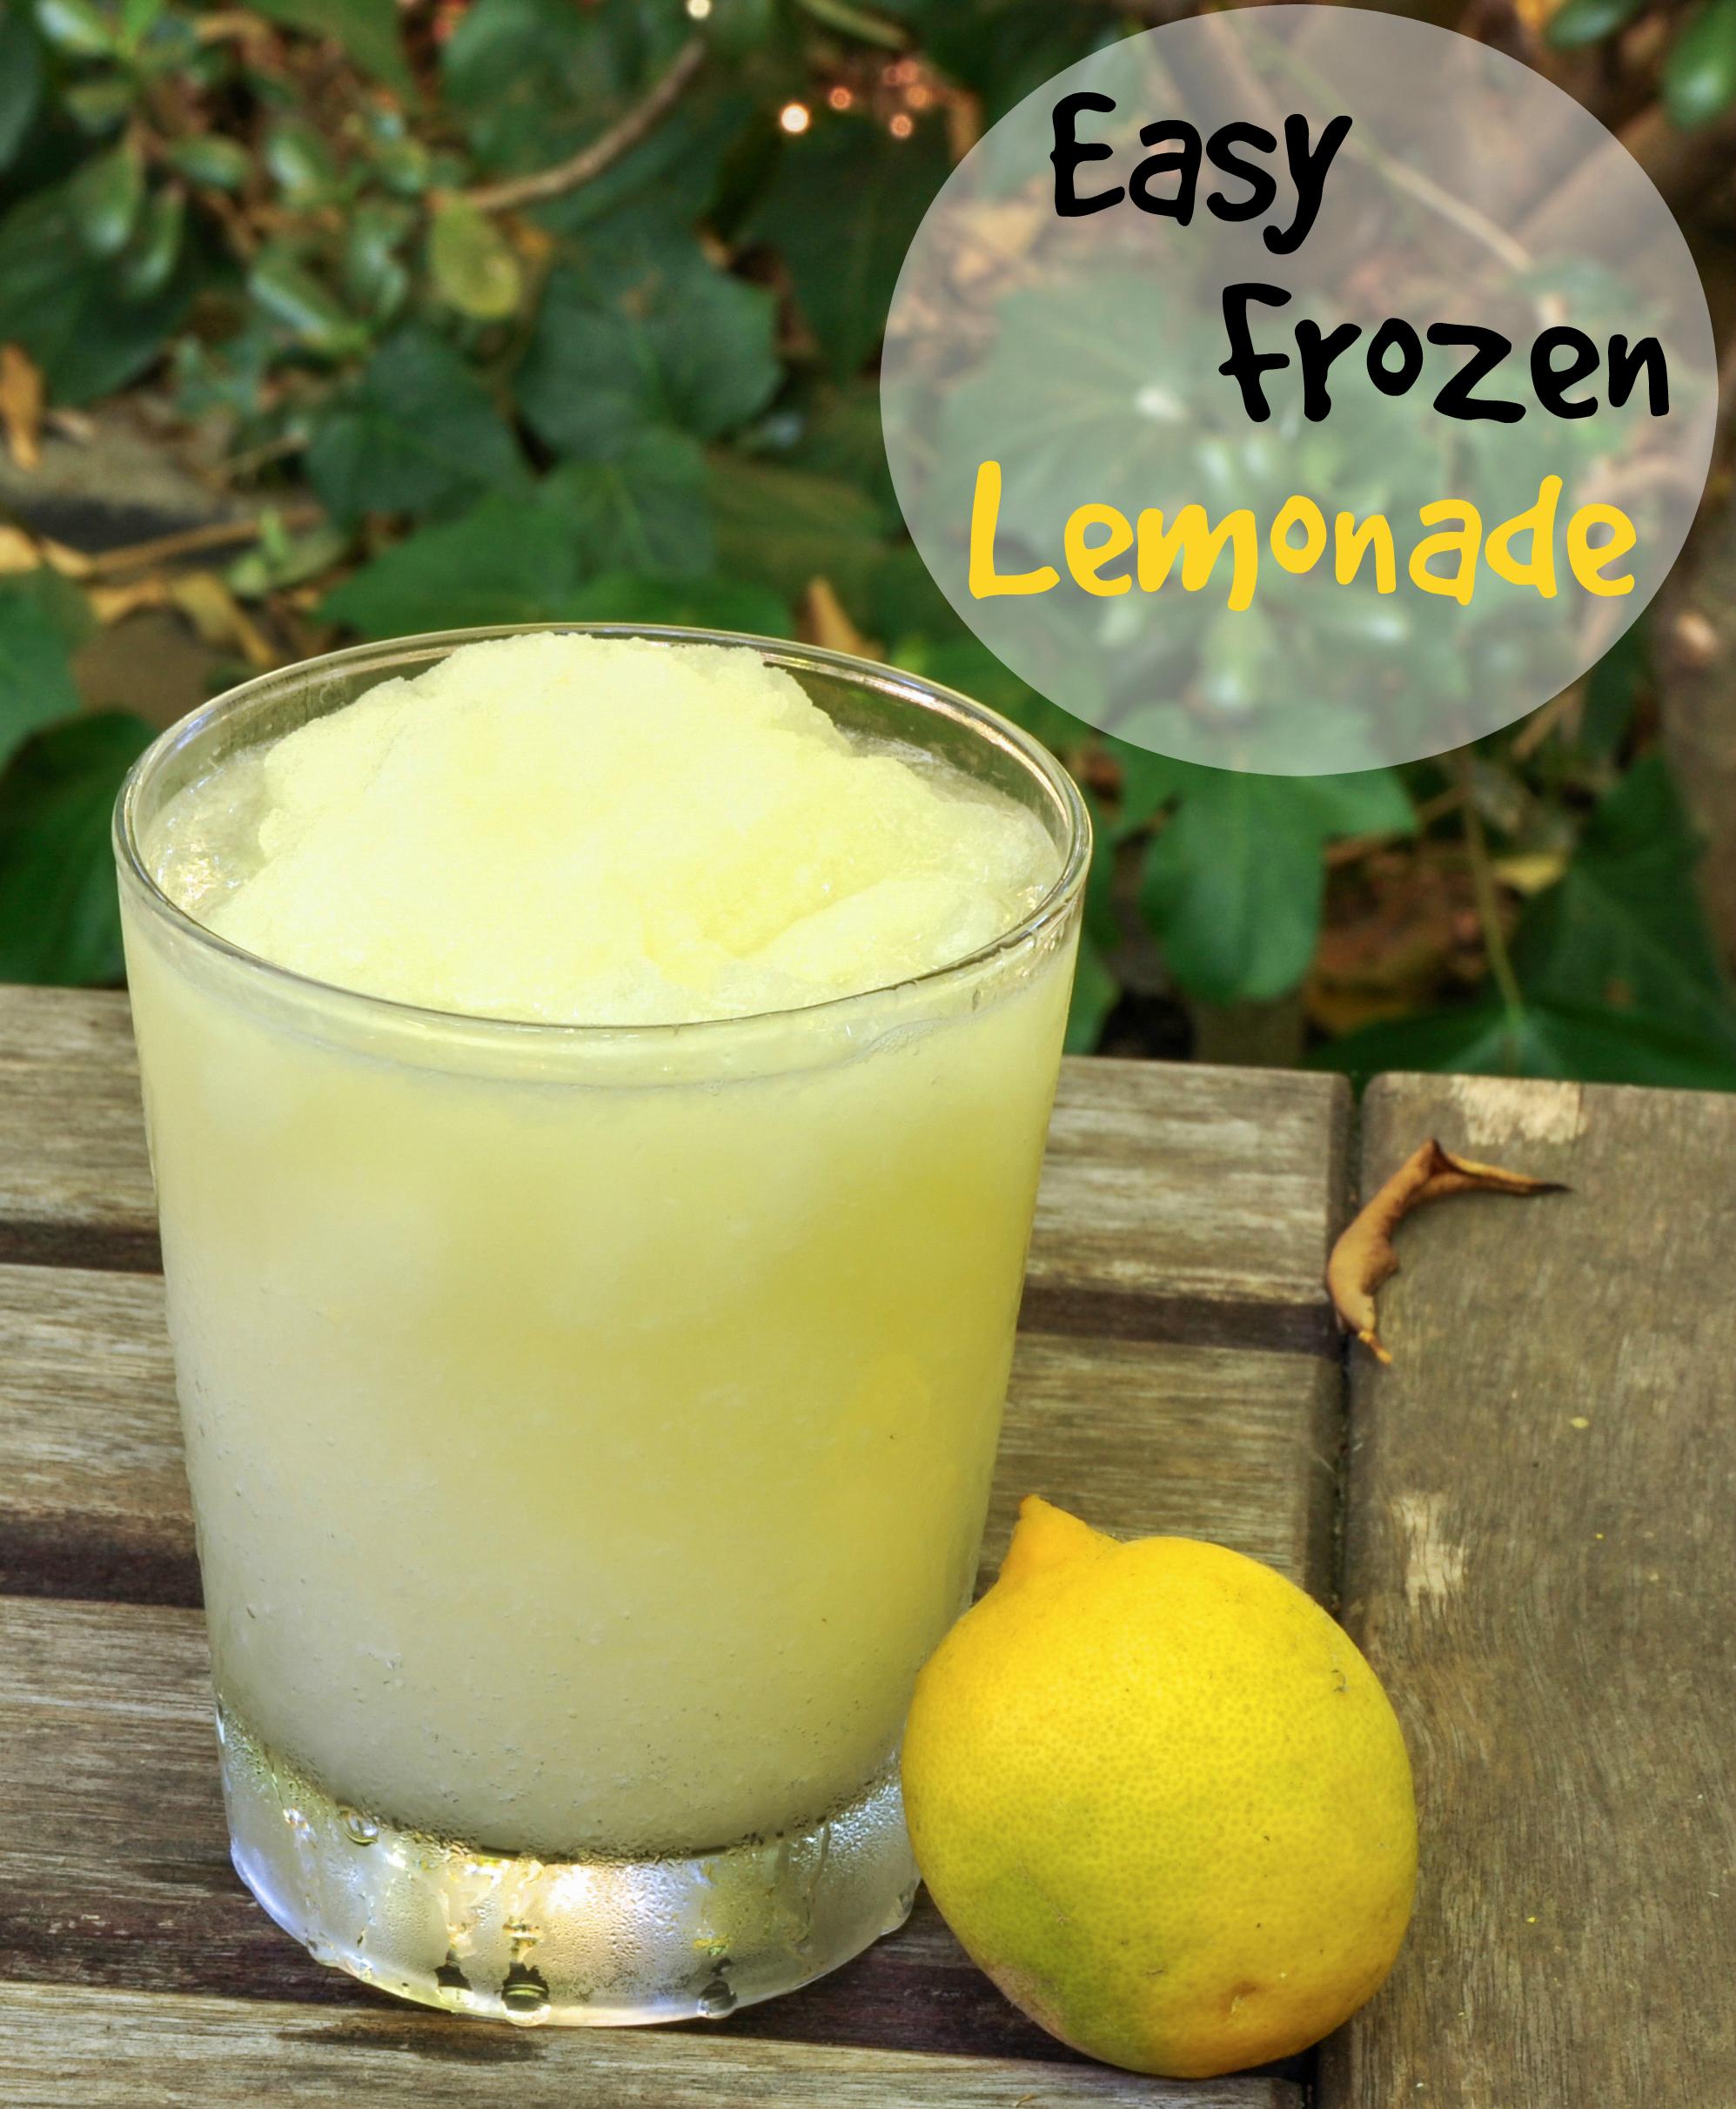 Raspberry Lemonade Icee Break Away Wicked Wax & Willow, Hand ...